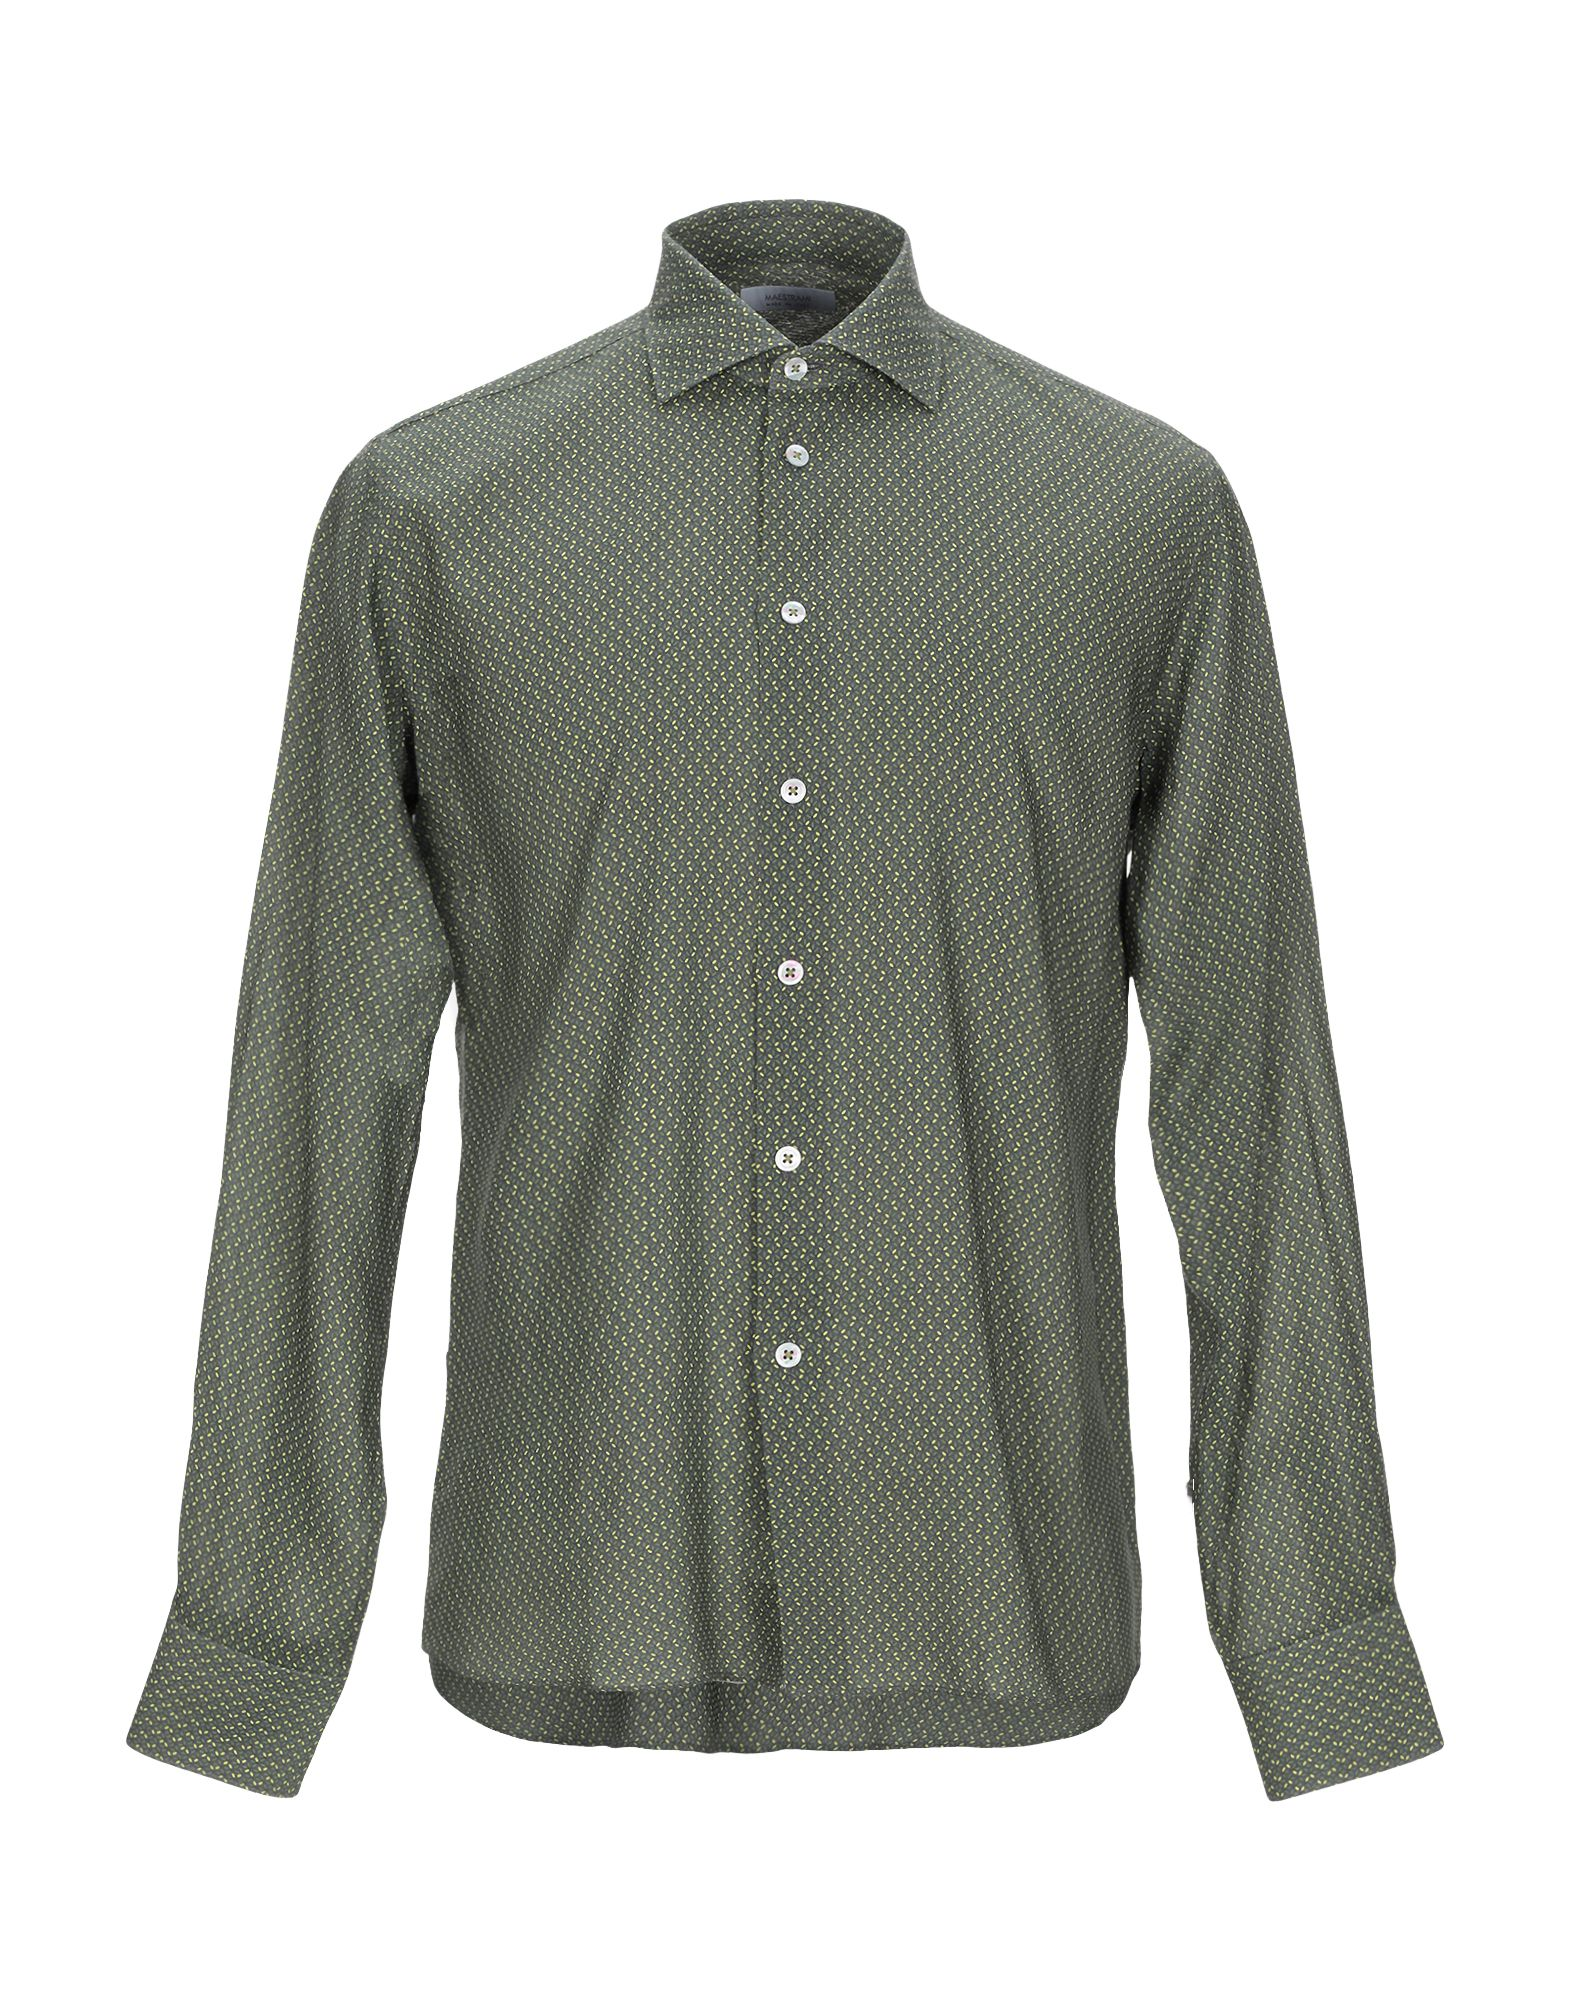 Camicia Fantasia Maestrami uomo uomo uomo - 38851290PV e46